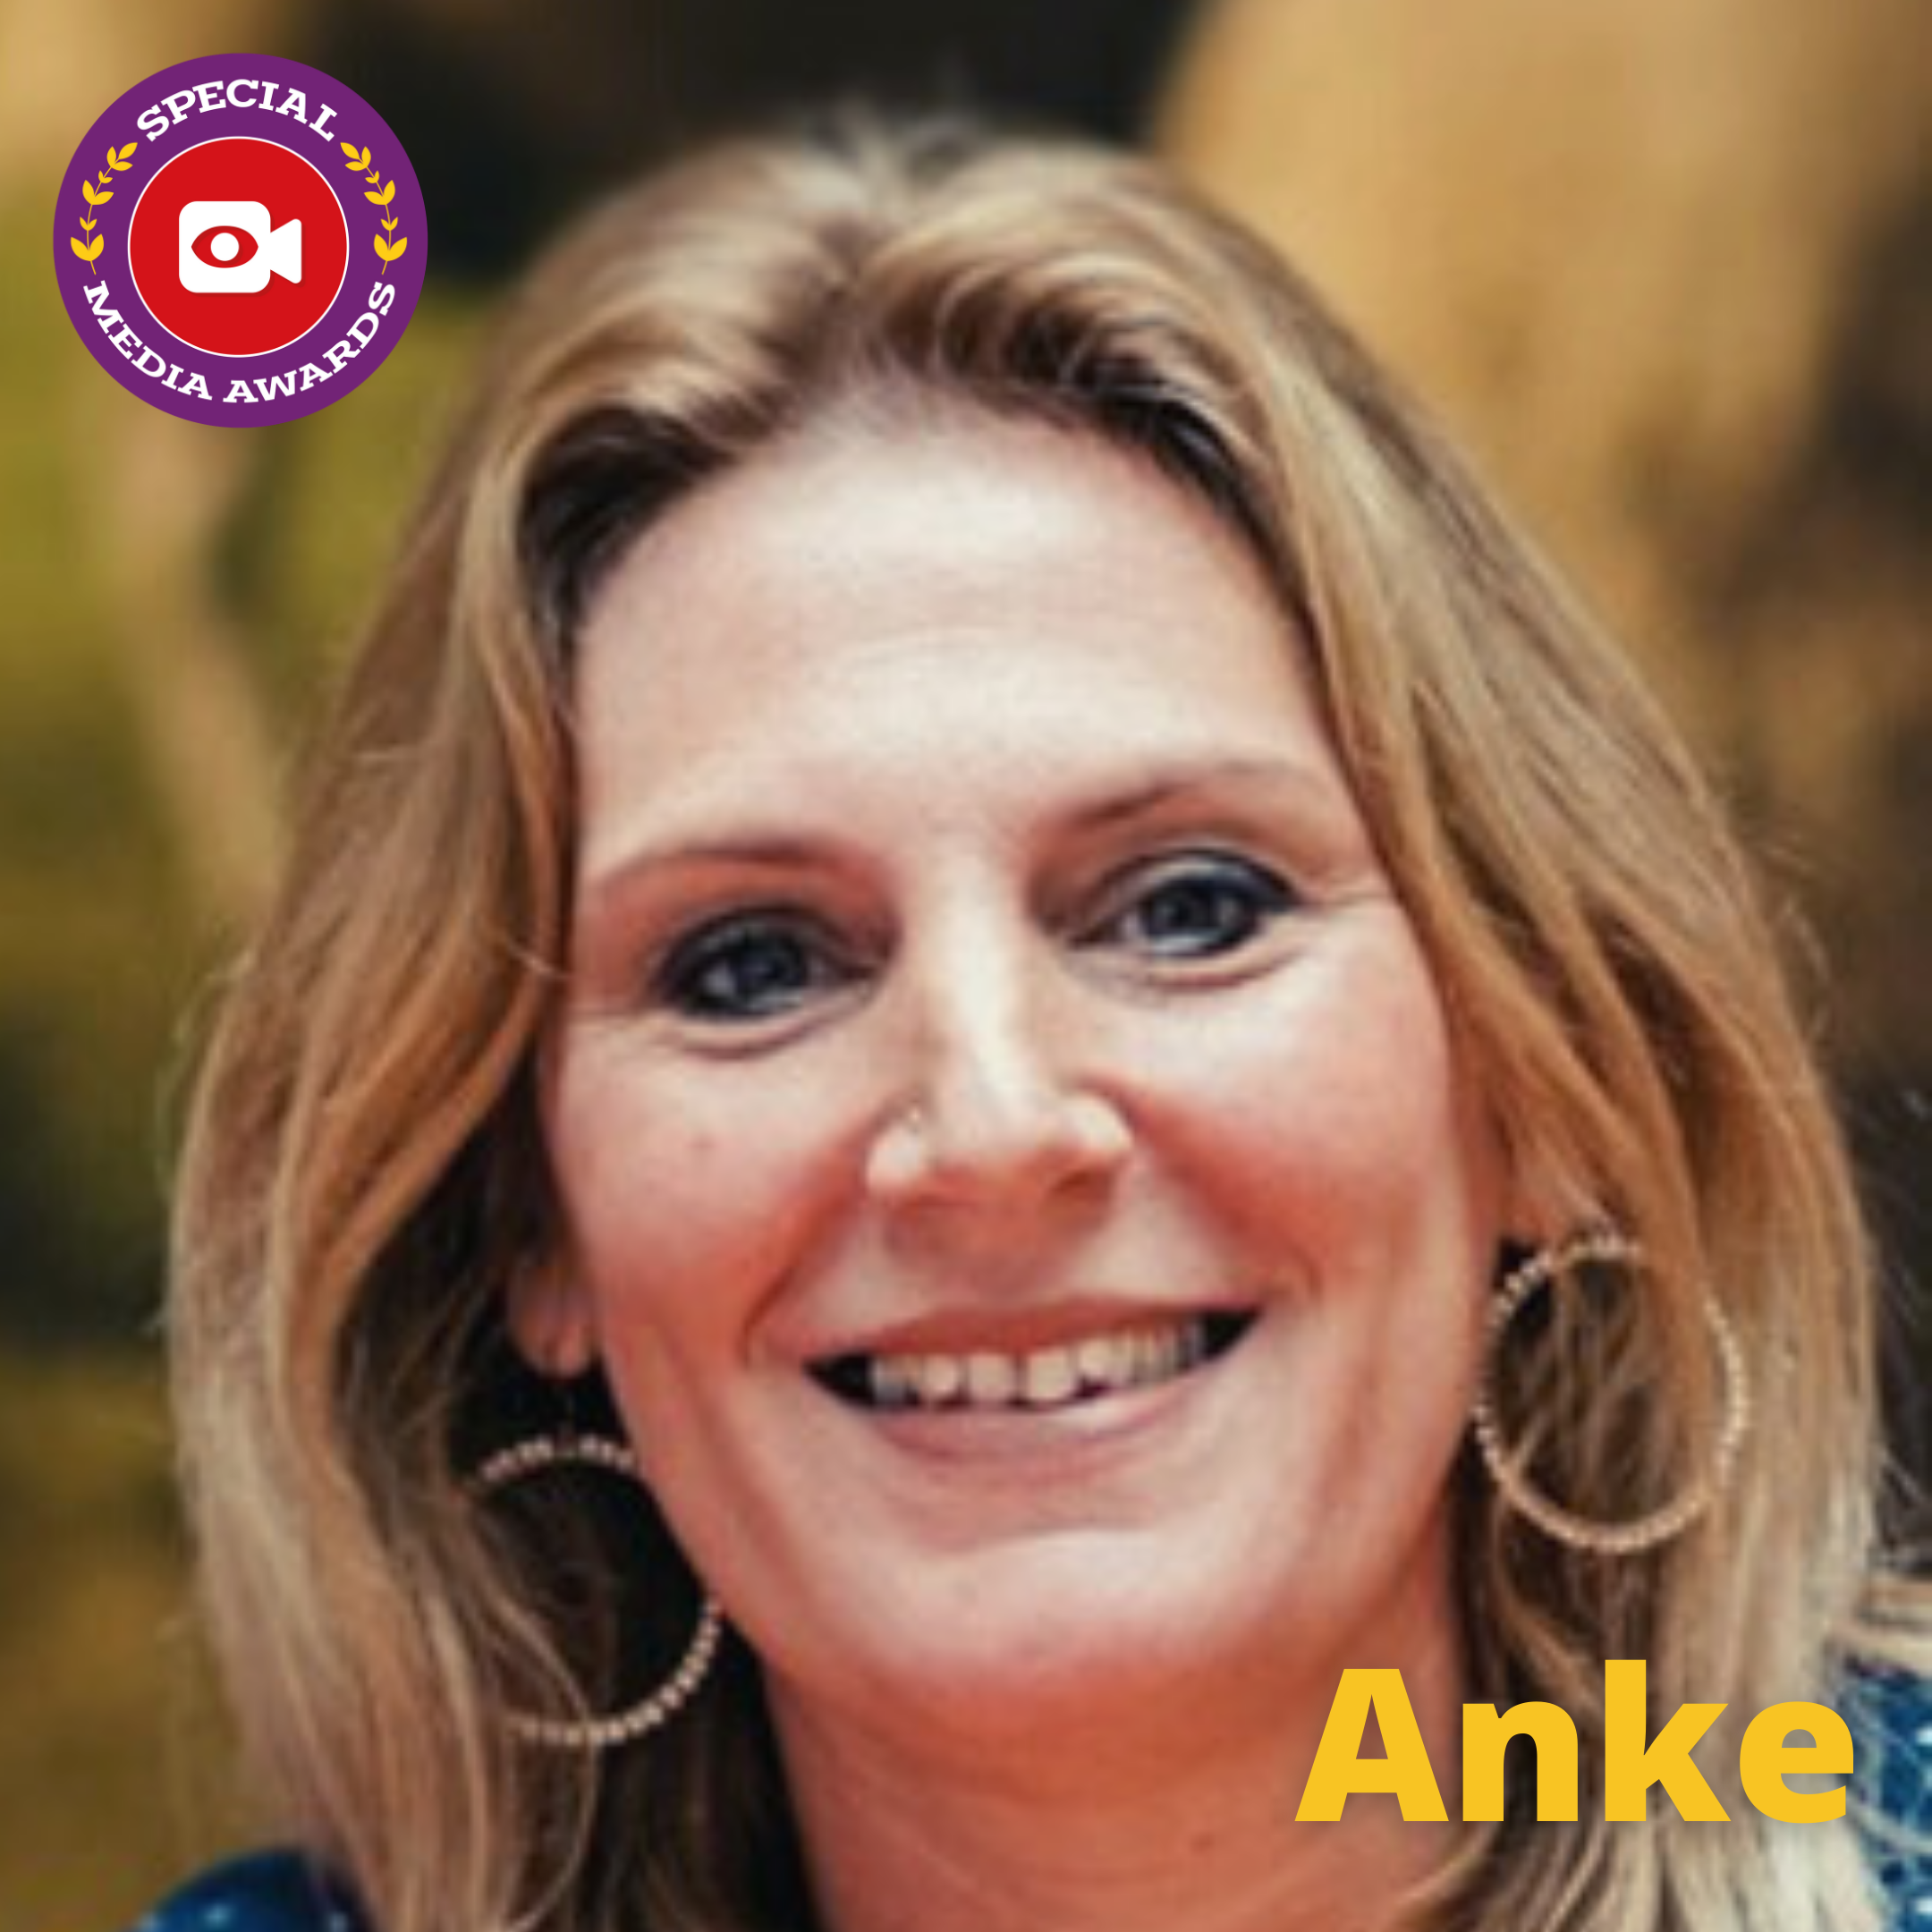 Anke van Breugel